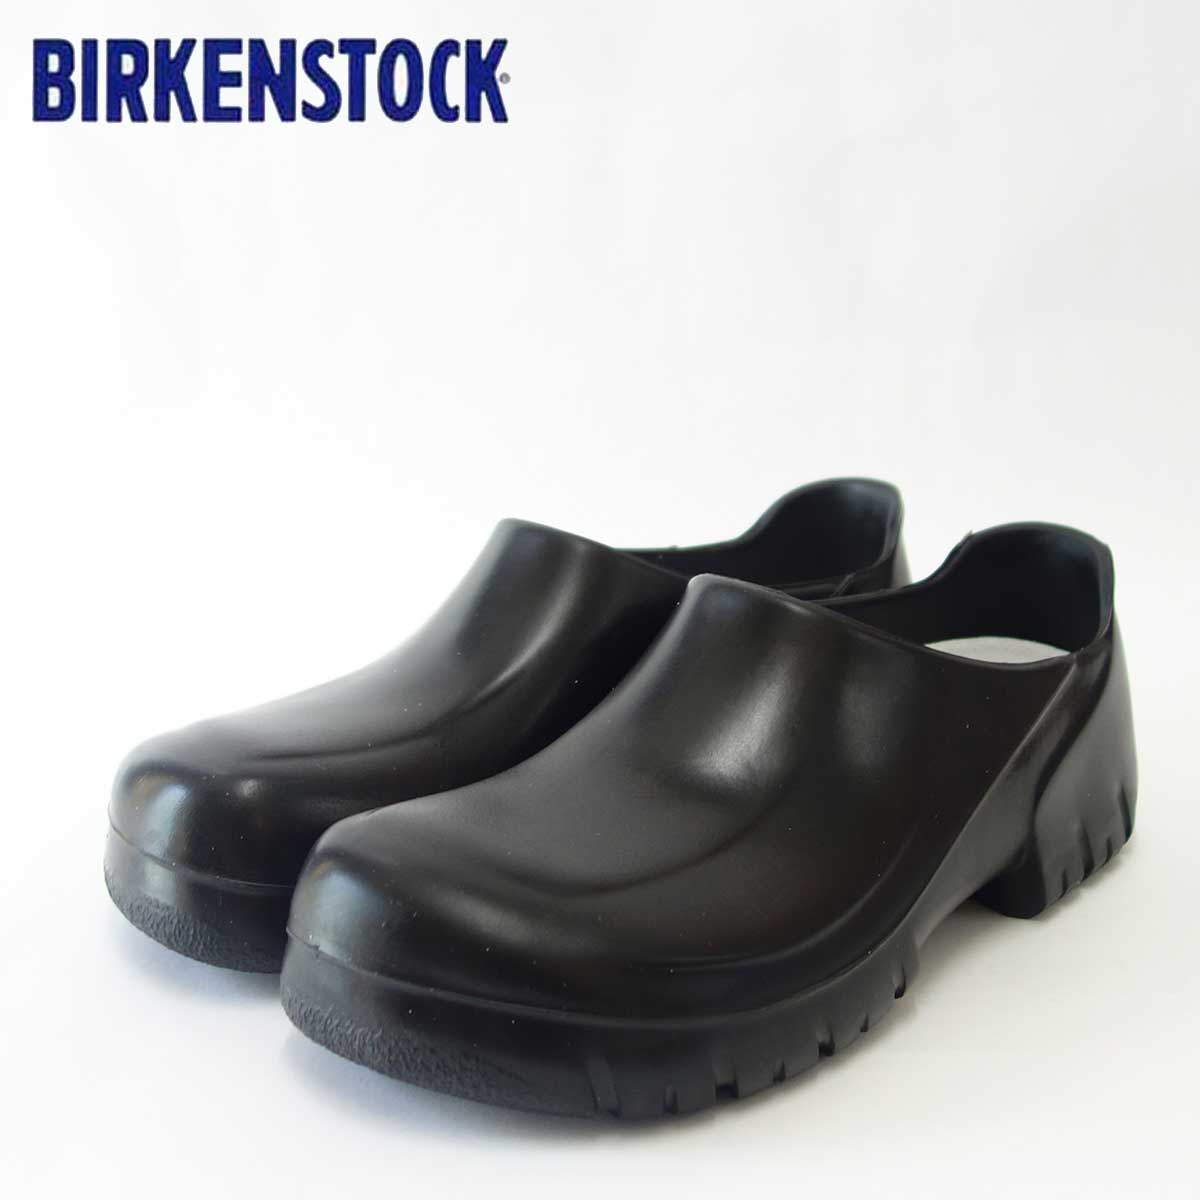 BIRKENSTOCK ビルケンシュトック プロフェッショナル A 630 GP 010272 ブラック(ユニセックス)ドイツ製コルクフットベッド サボ「靴」サンダル 飲食店用